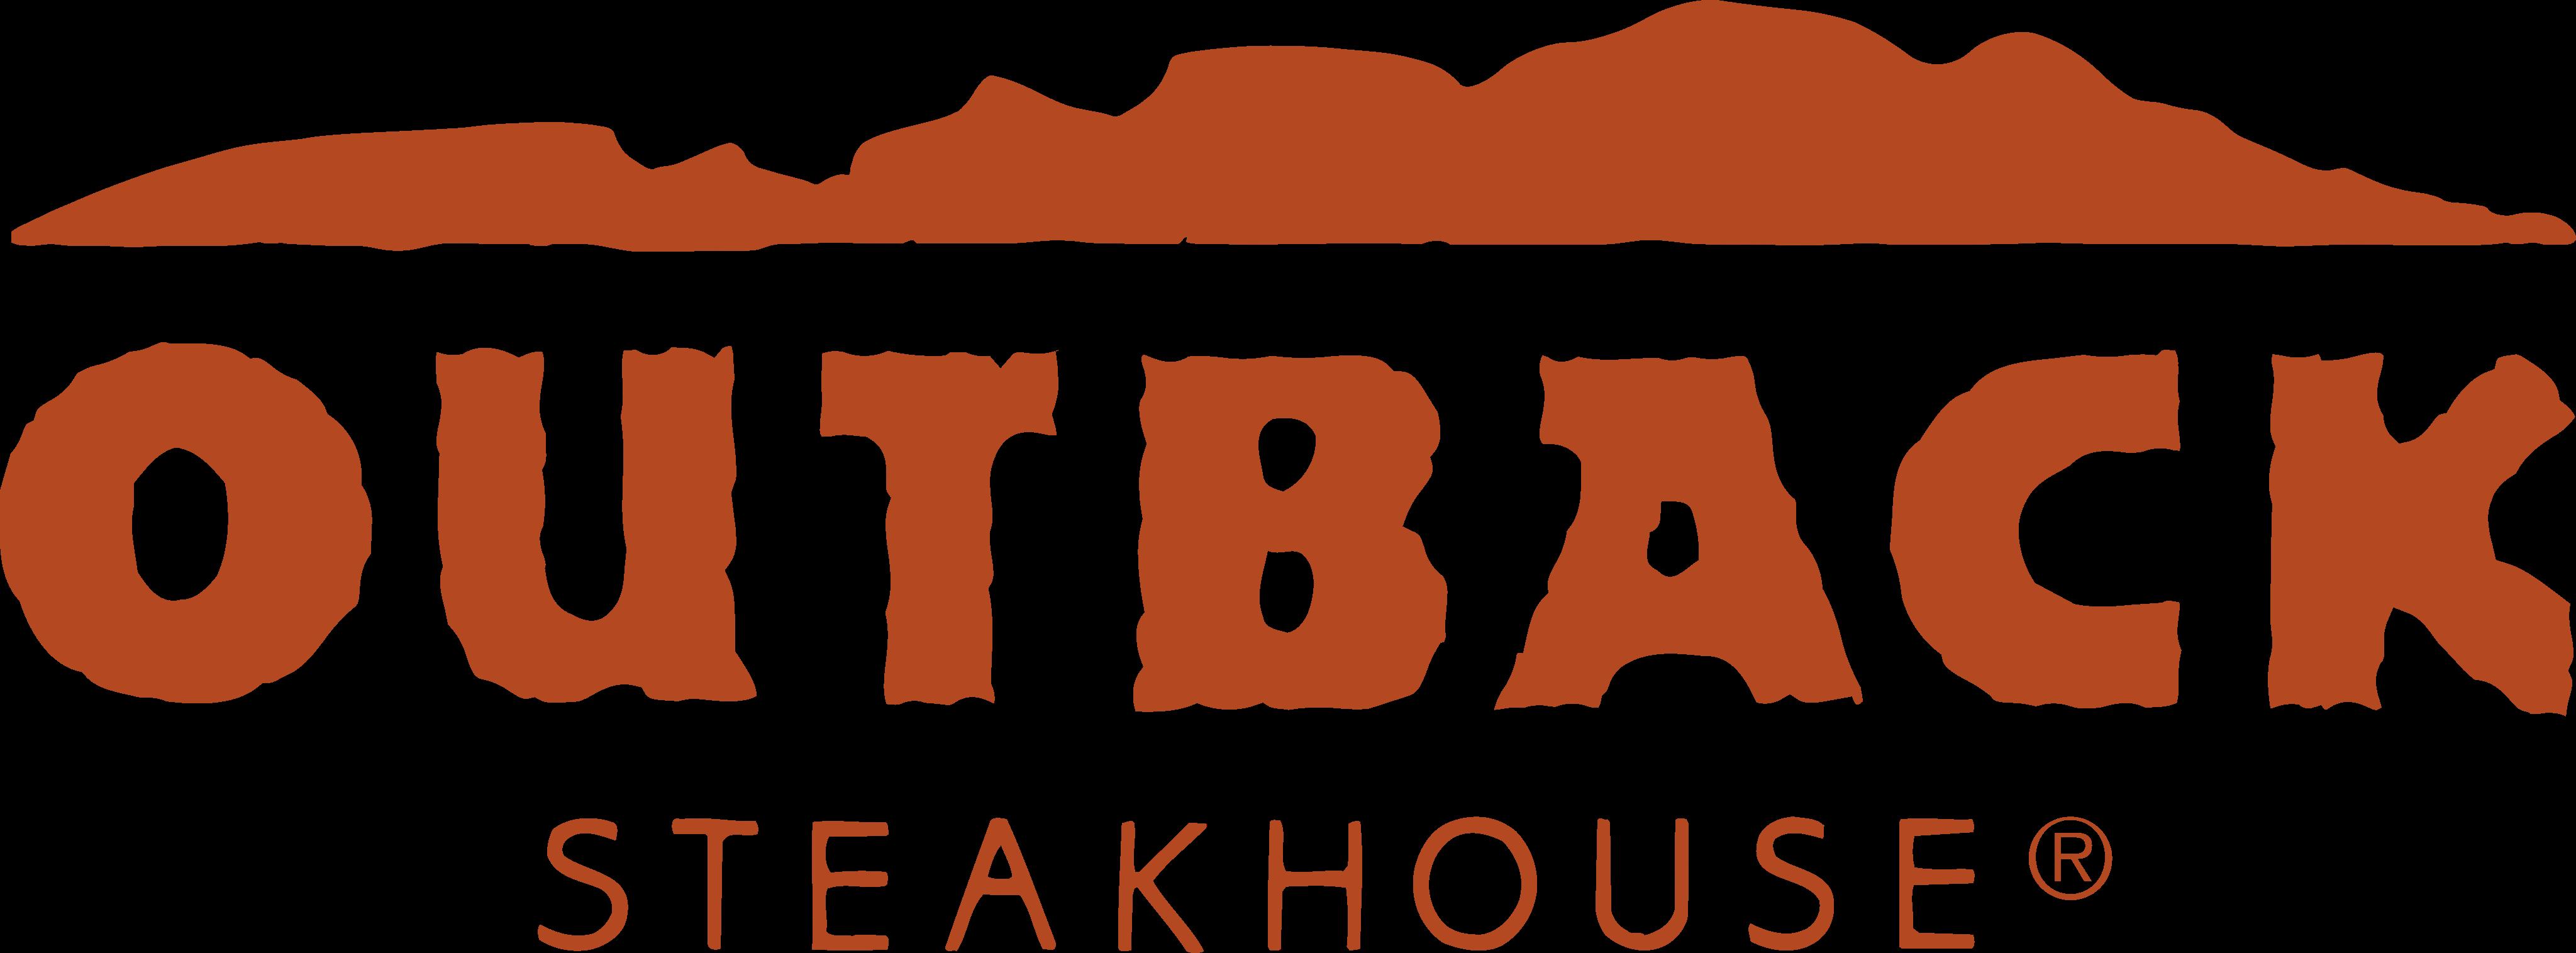 outback logo 1 - Outback Steakhouse Logo